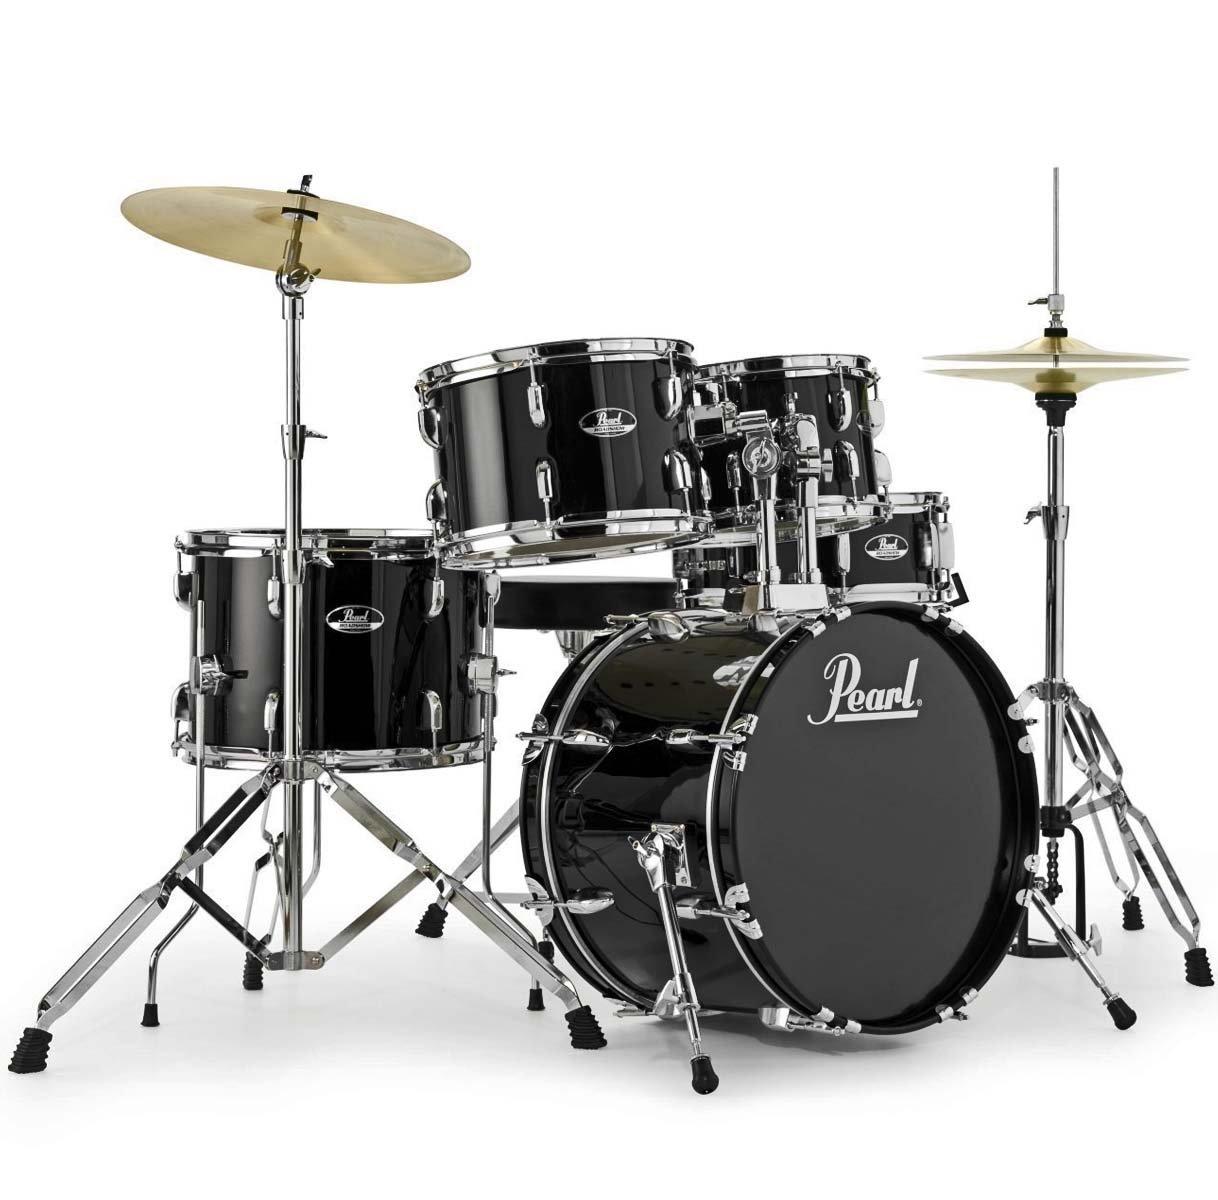 Pearl Road Show RS585C C31?Jet Black, batteria a percussioni, cuffie, 1?paio di bacchette